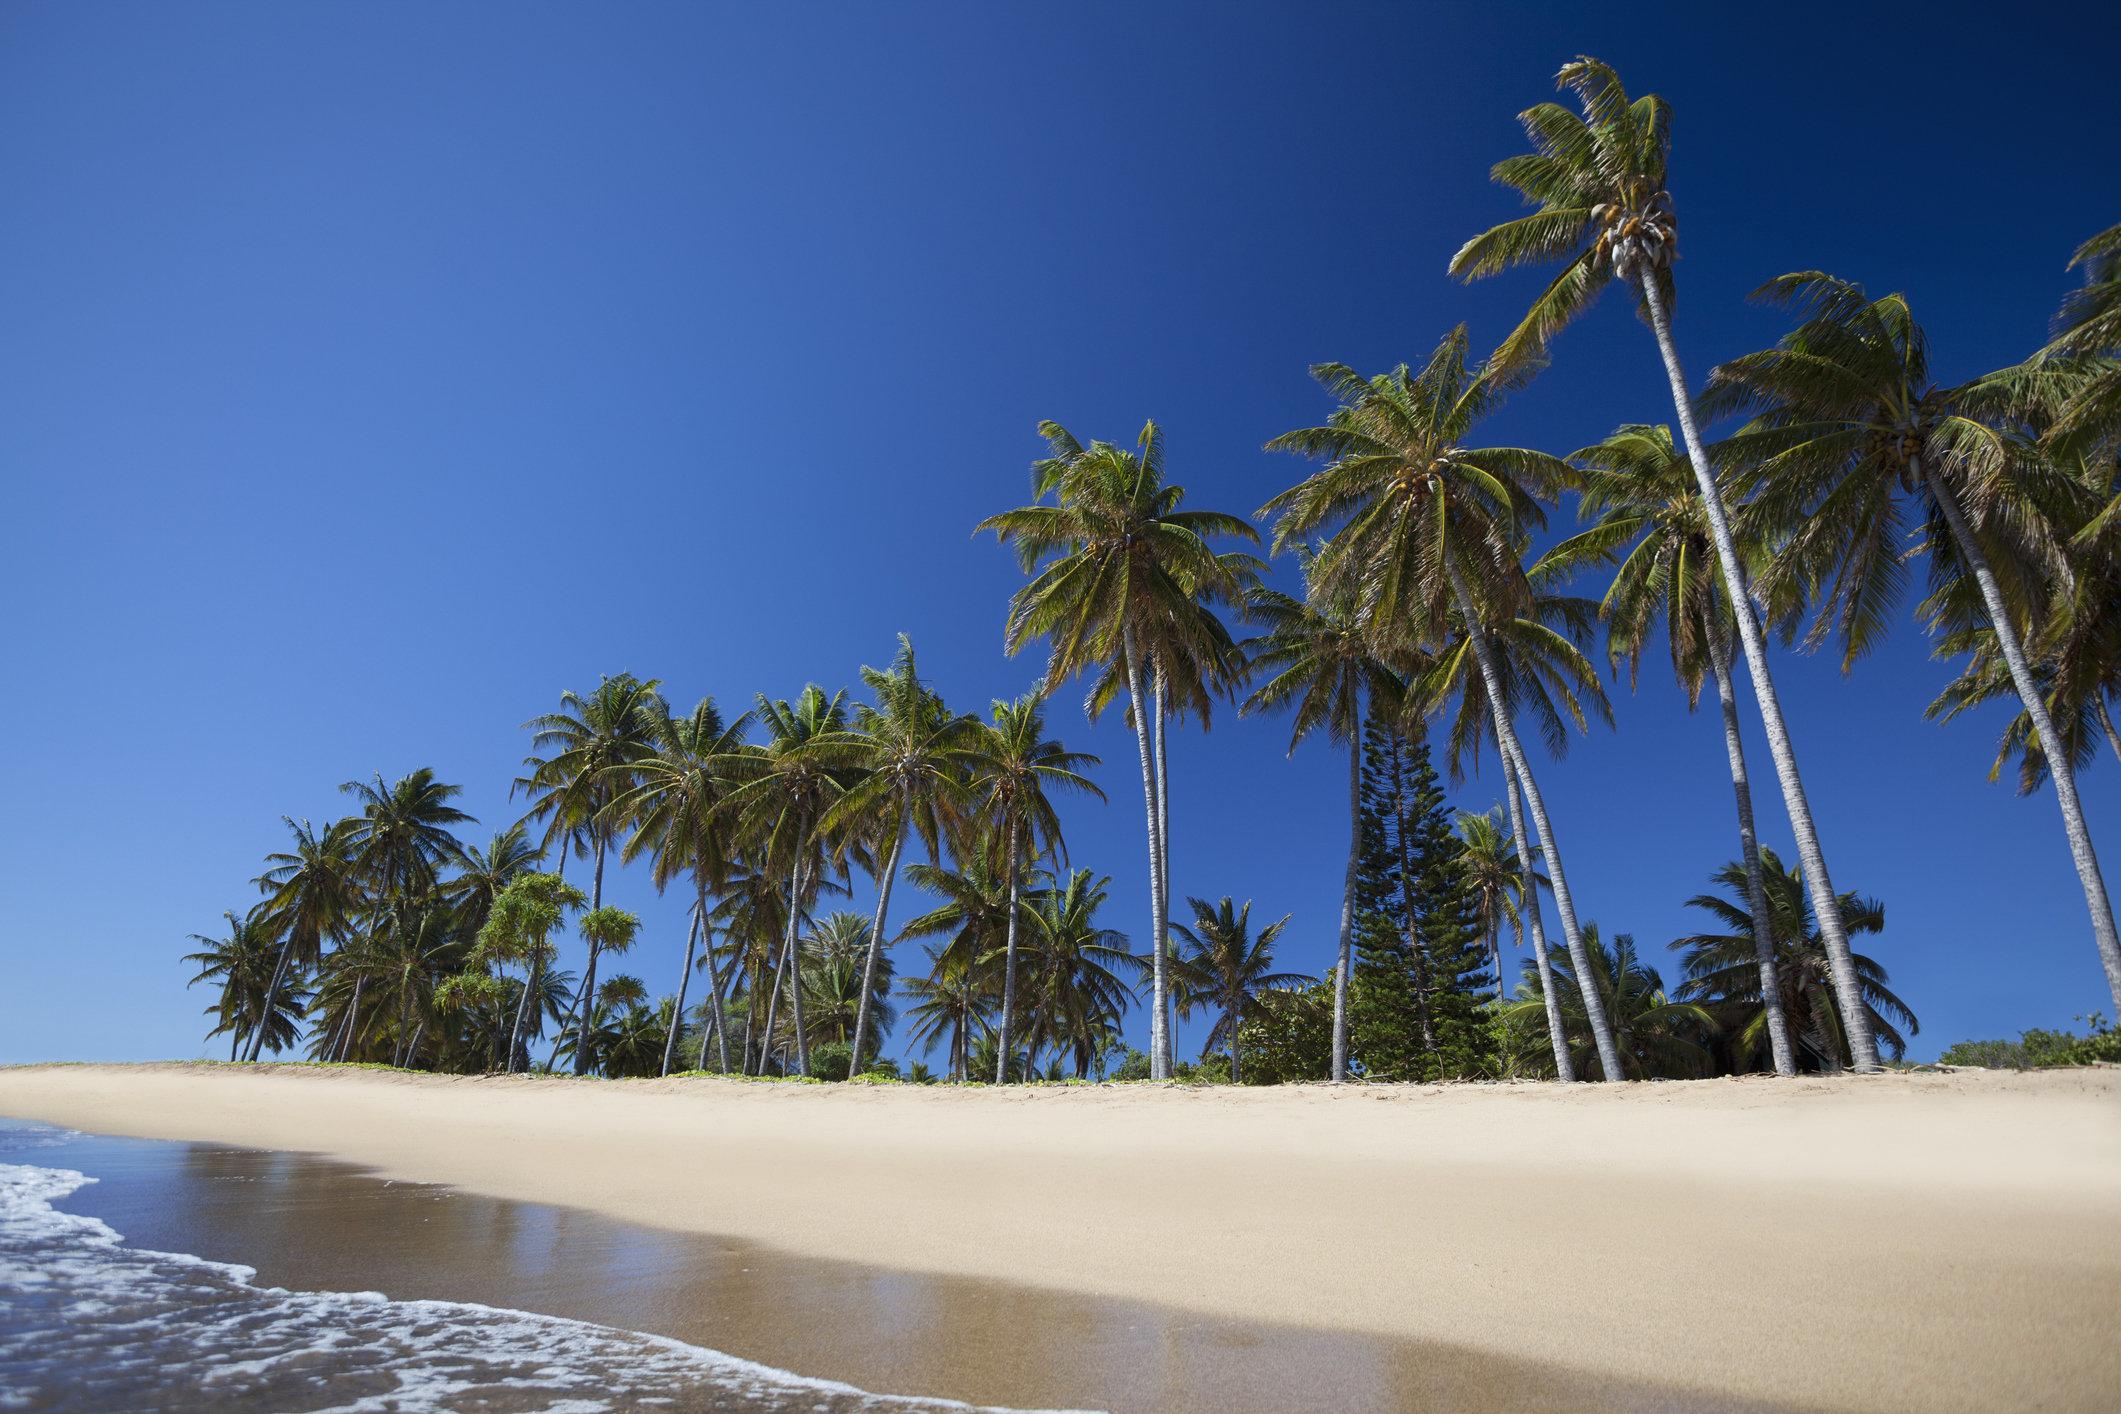 Lanai, Hawaii, United States of America